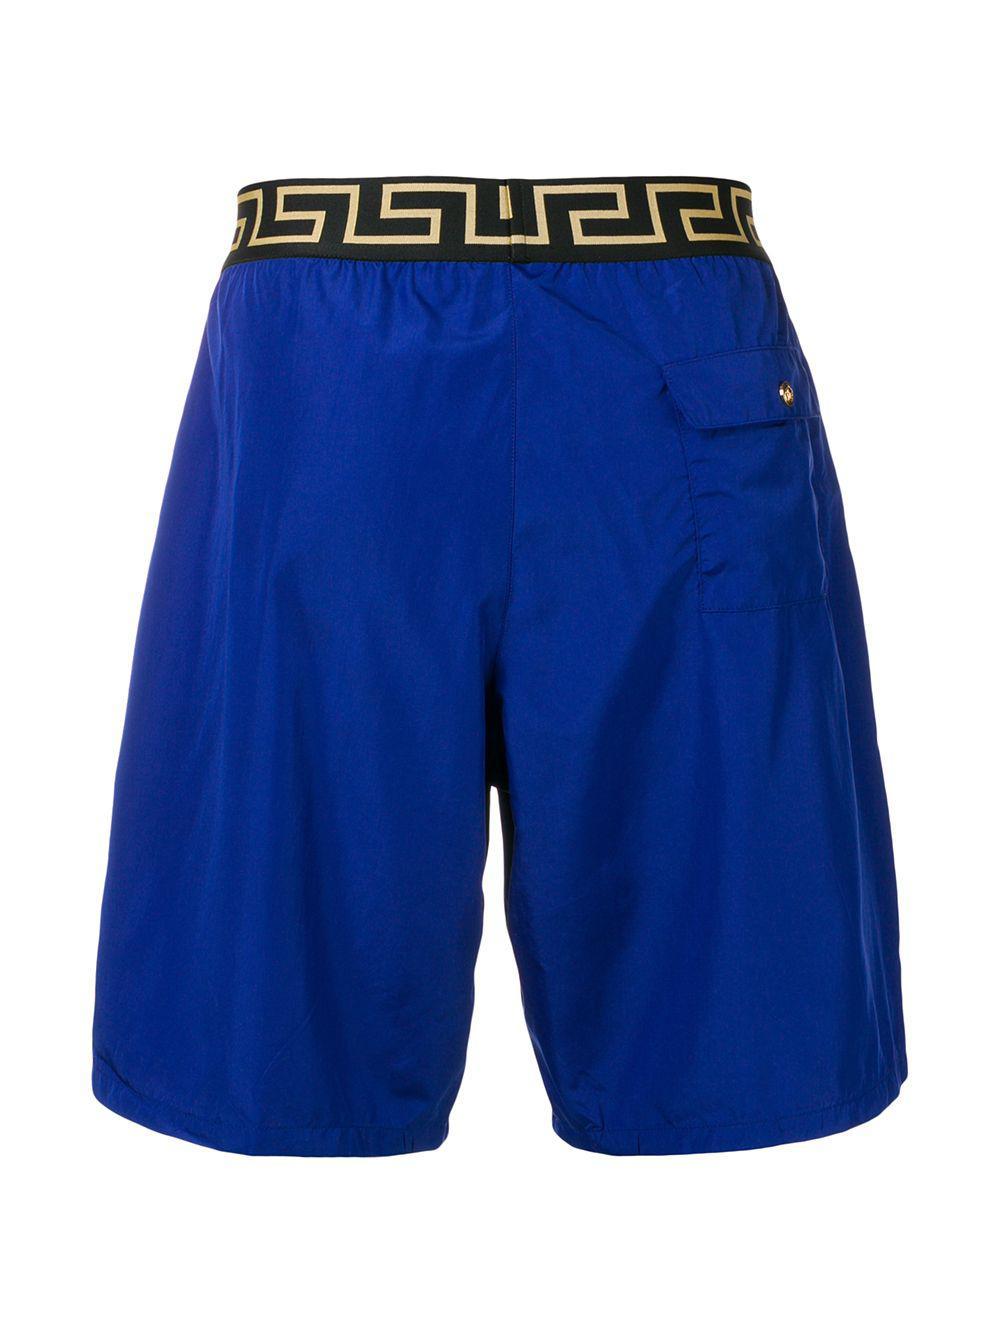 a8da52c2b0 Versace Printed Logo Swim Shorts in Blue for Men - Lyst